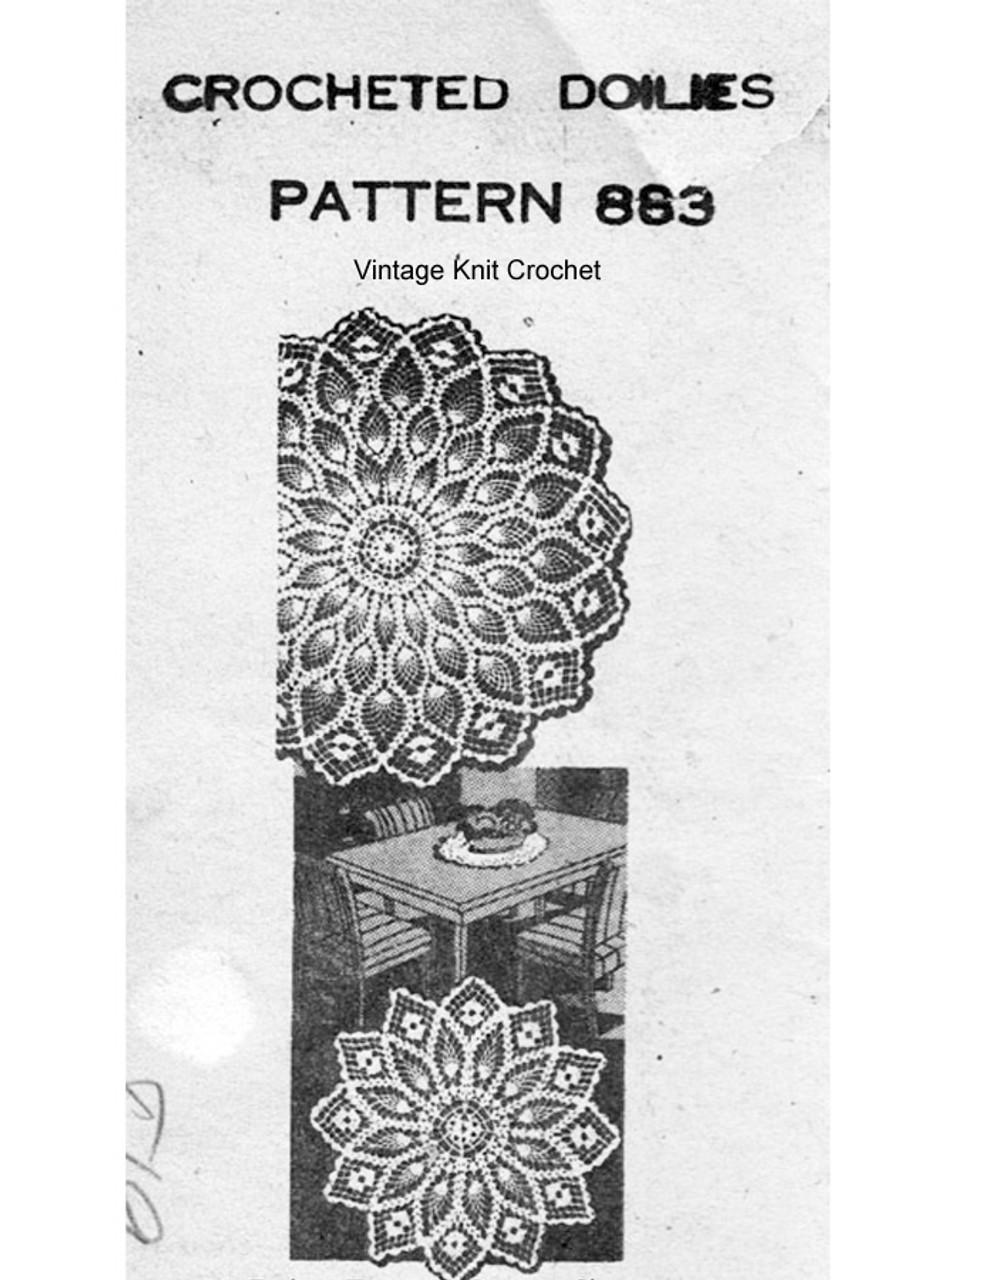 Crochet Centerpiece Doily Pattern, Mail Order Design 883